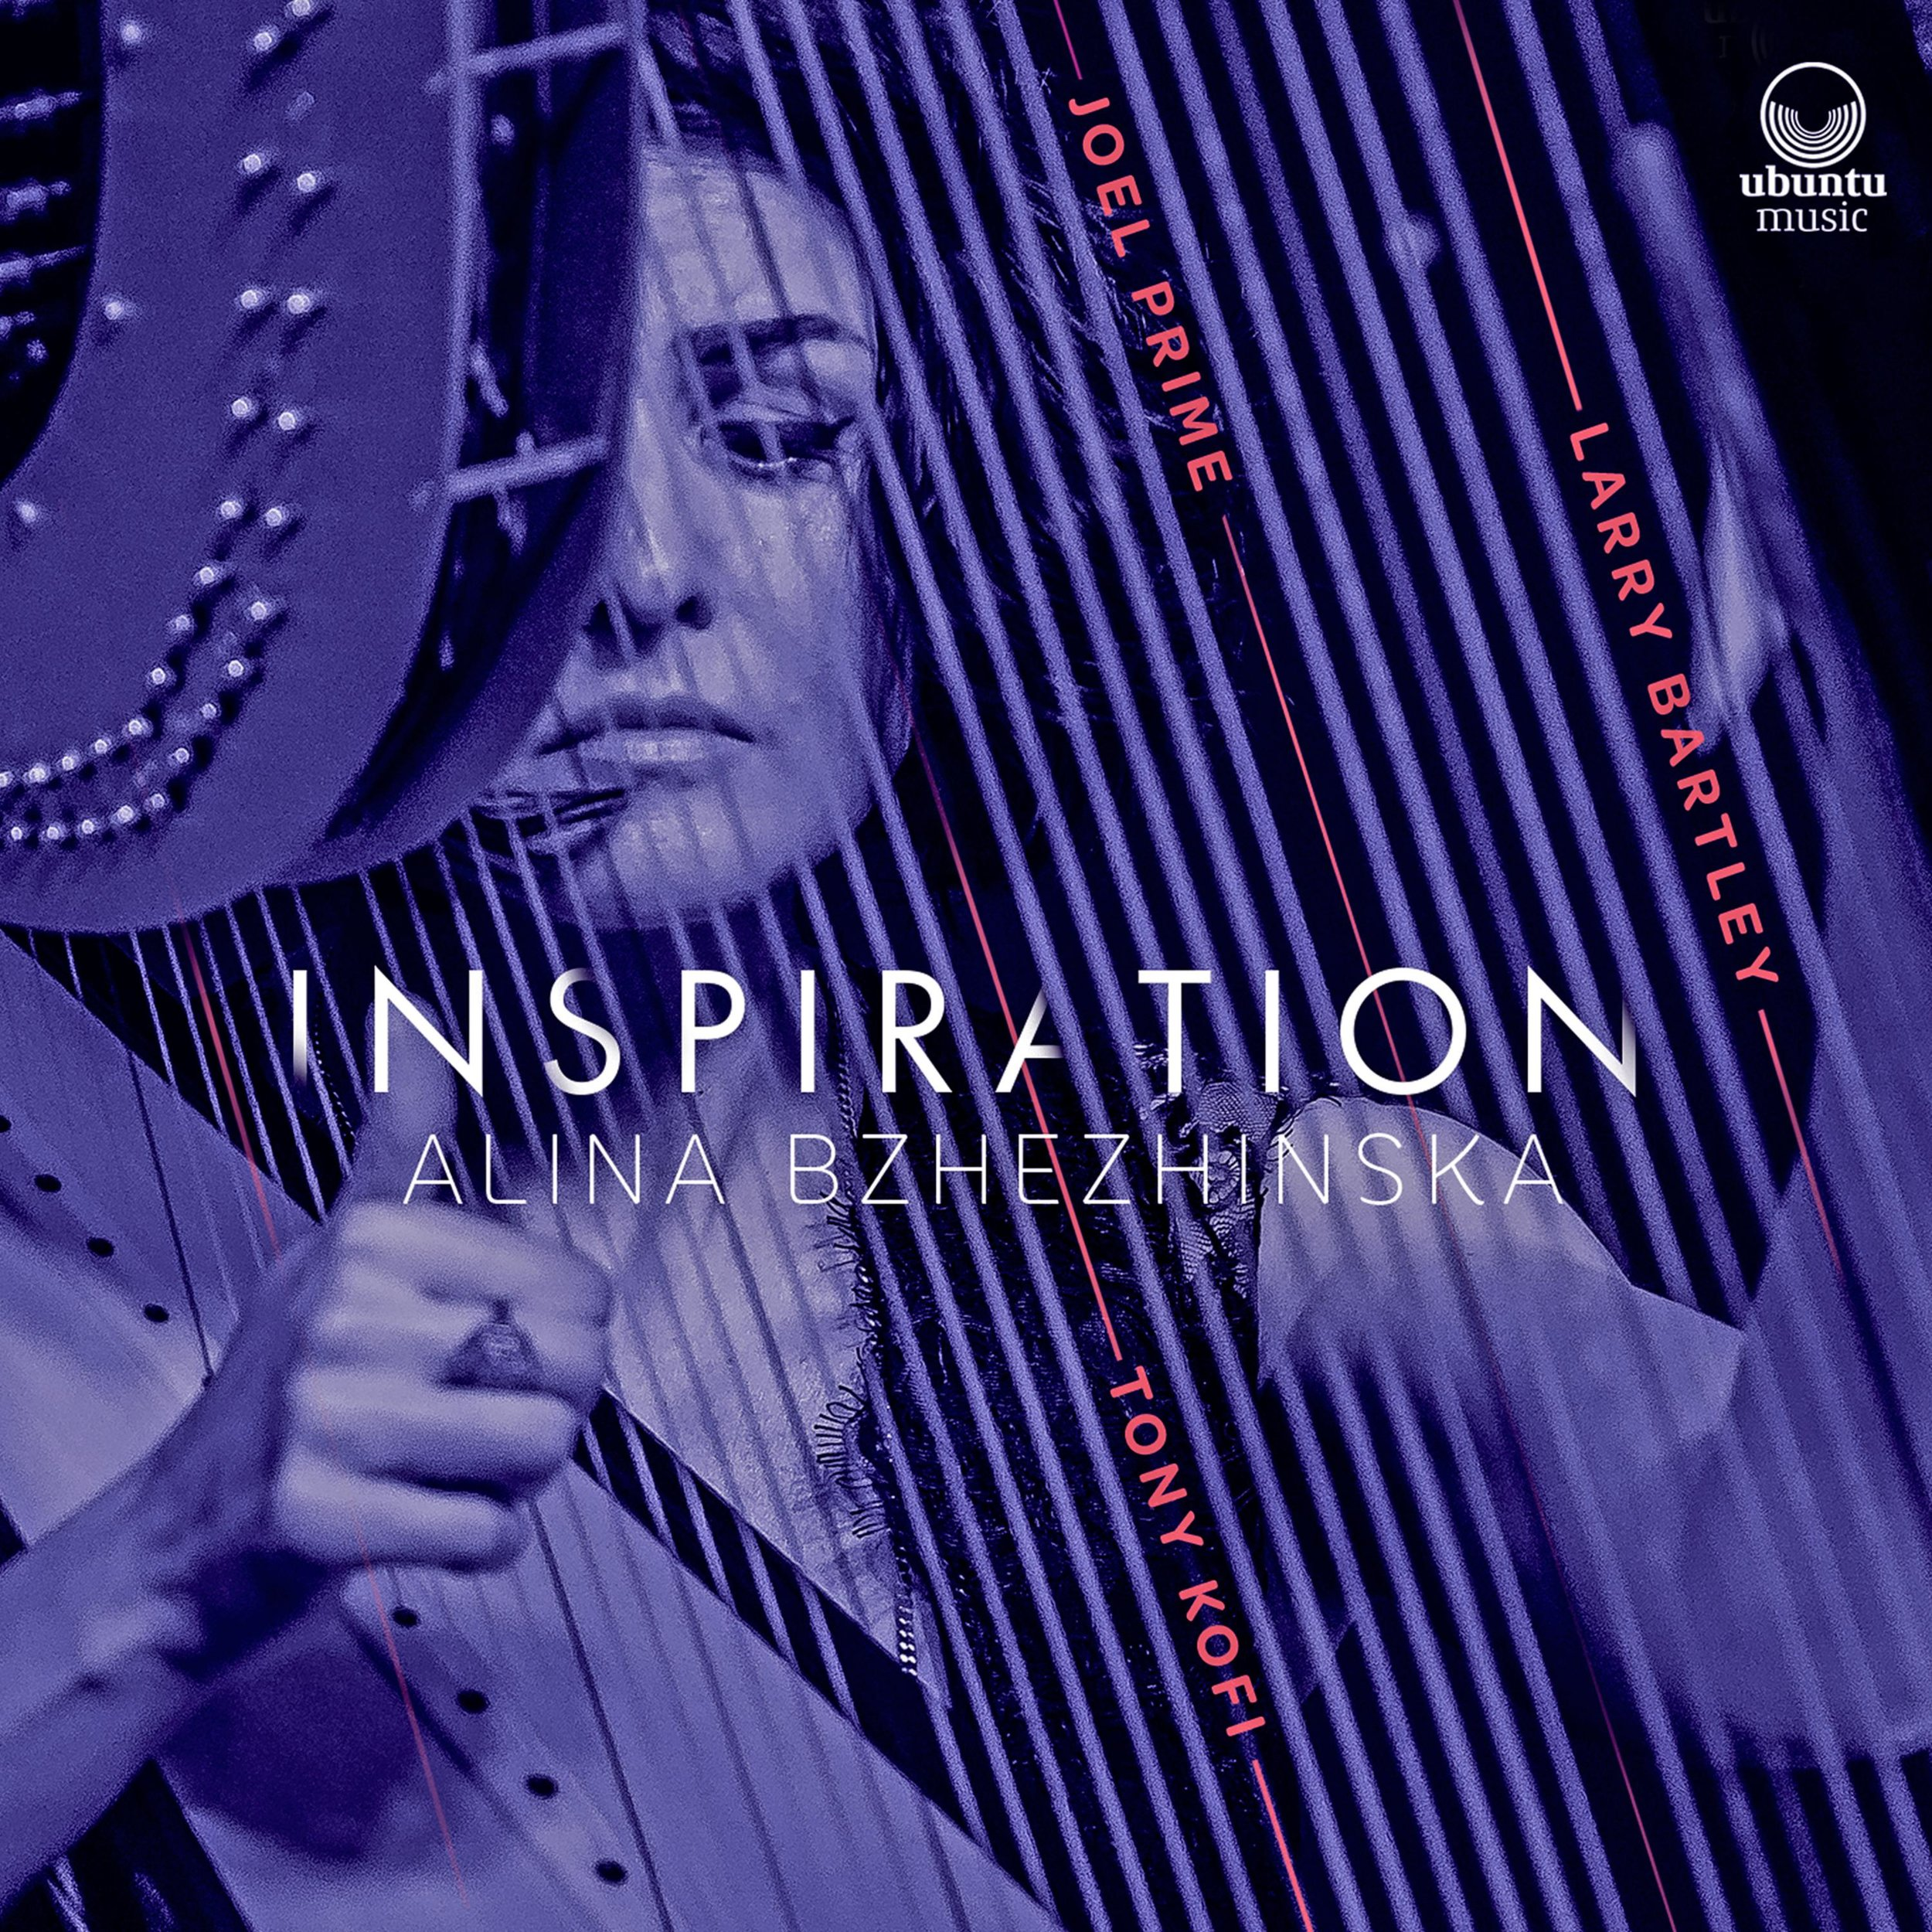 Alina Bzhezhinska / Inspiration